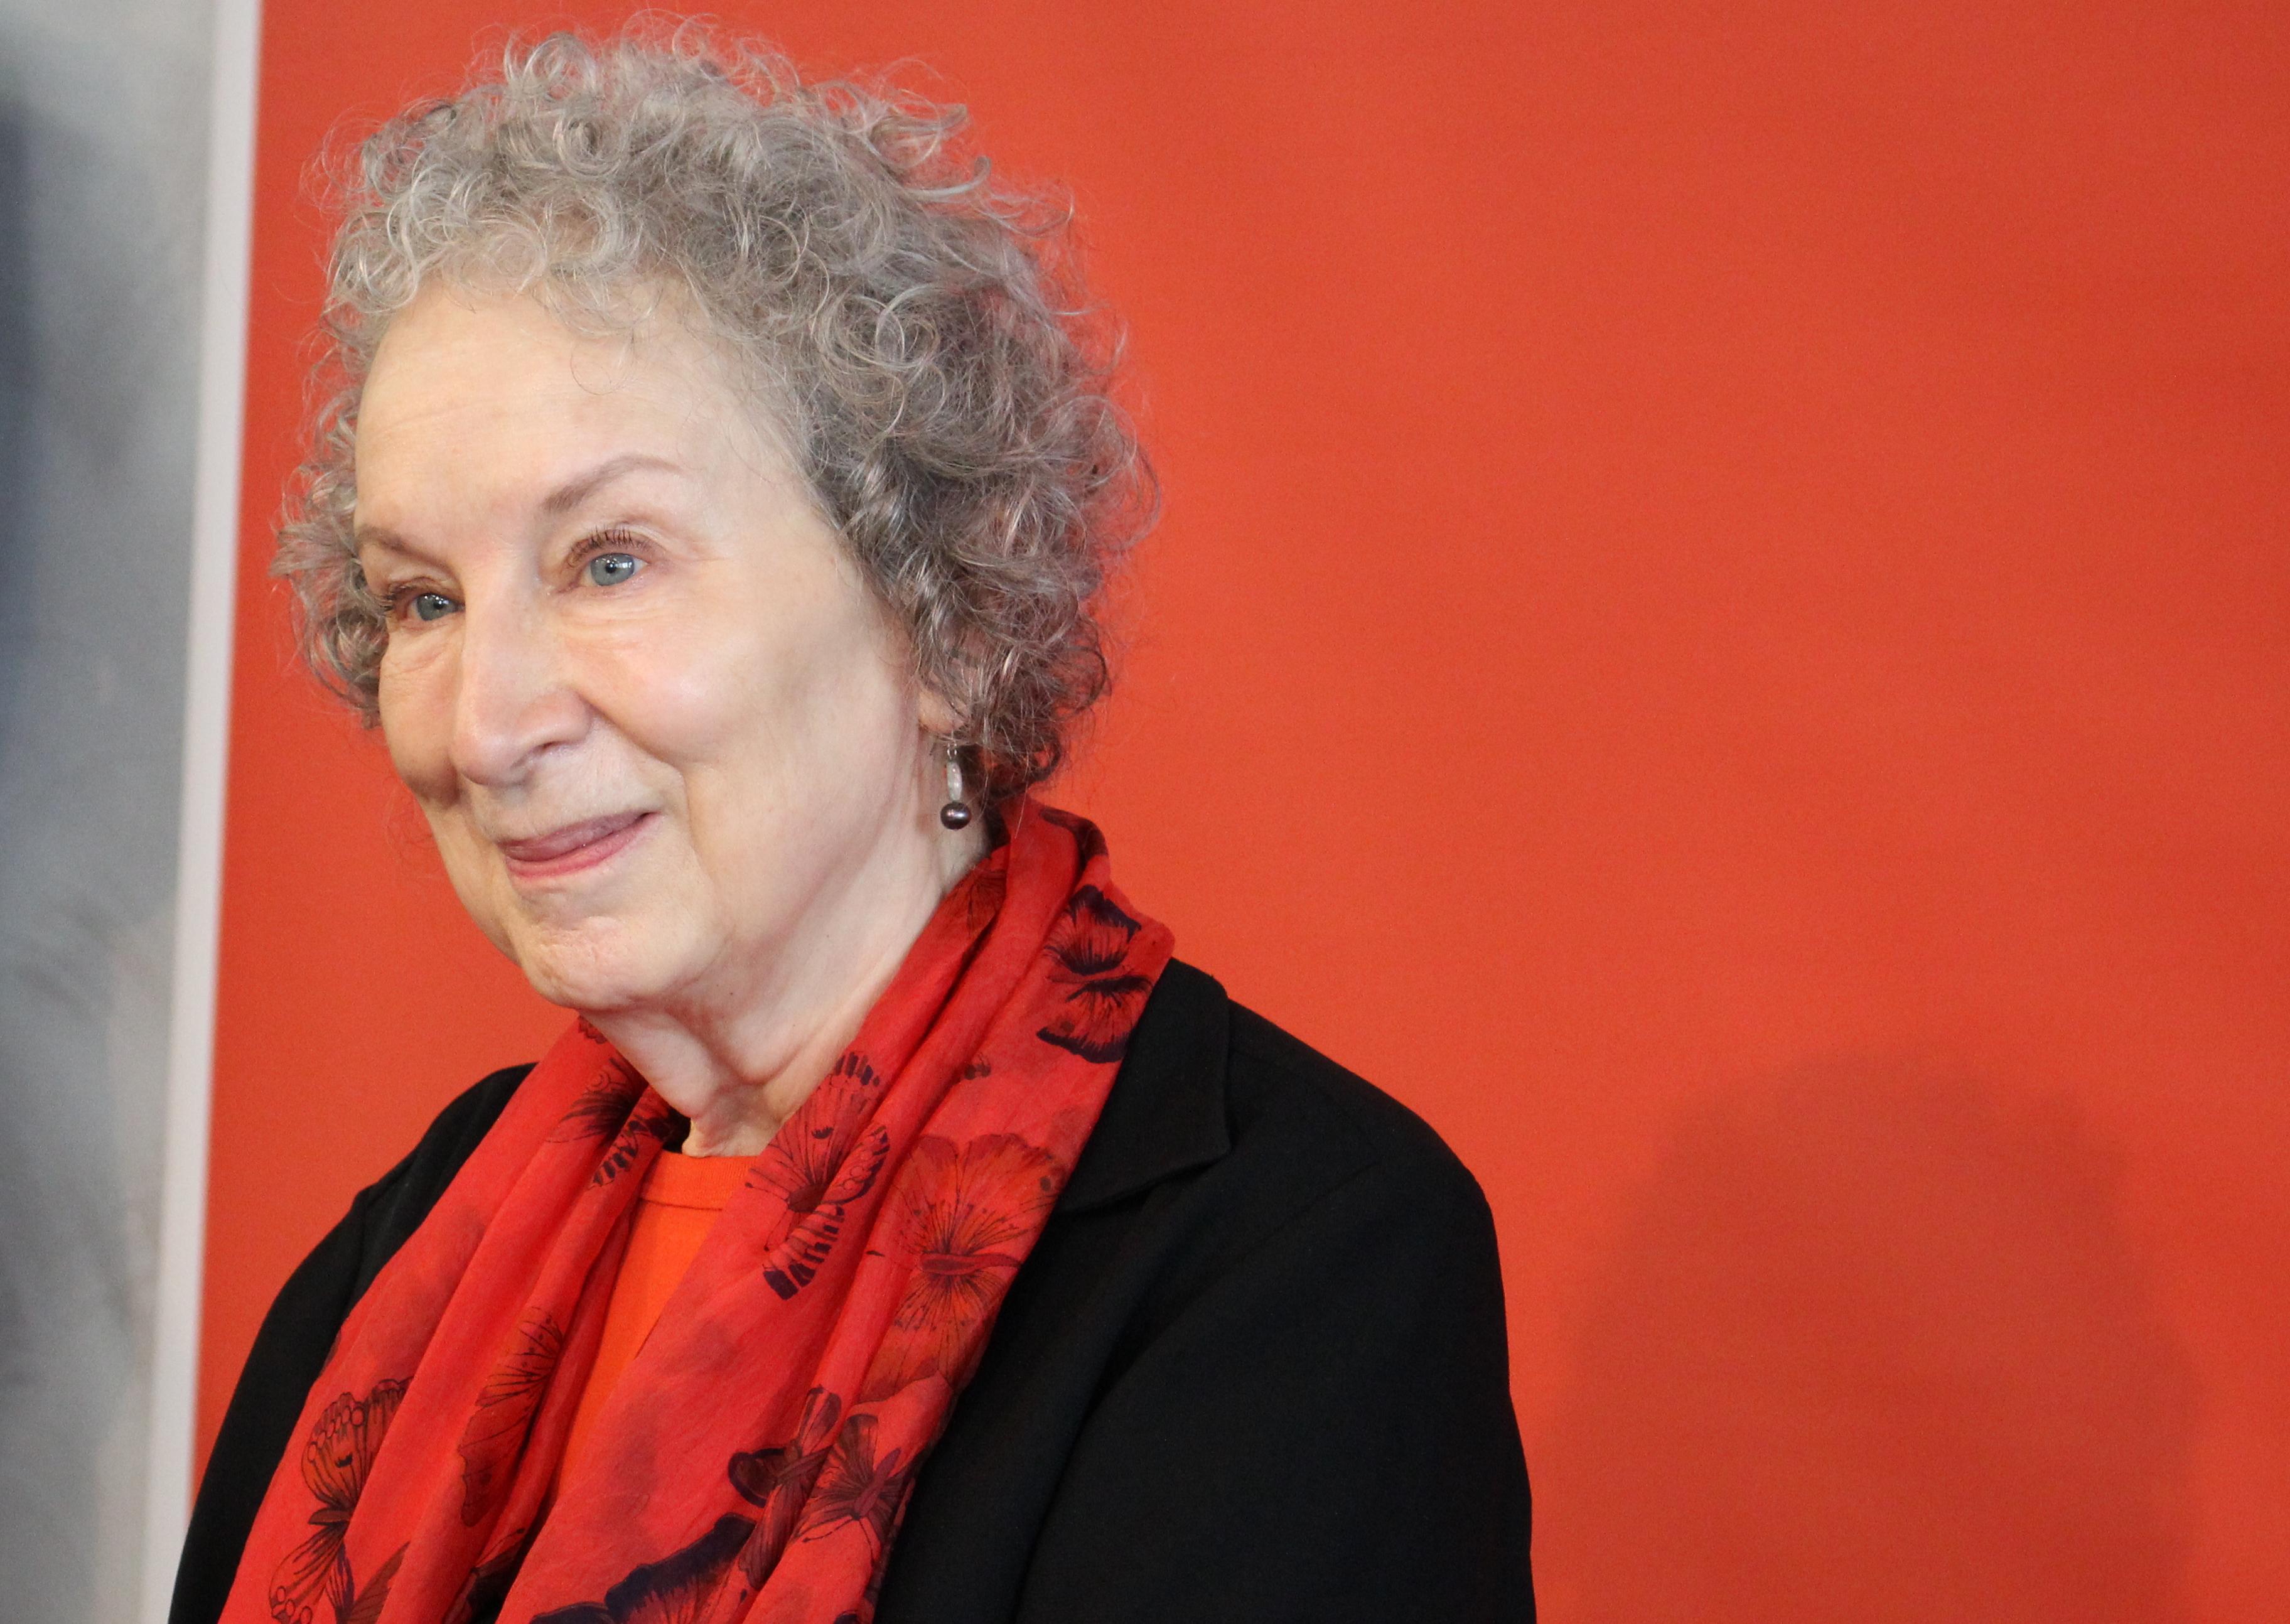 File:Margaret Atwood - Foire du Livre de Francfort (37735253561).jpg -  Wikimedia Commons